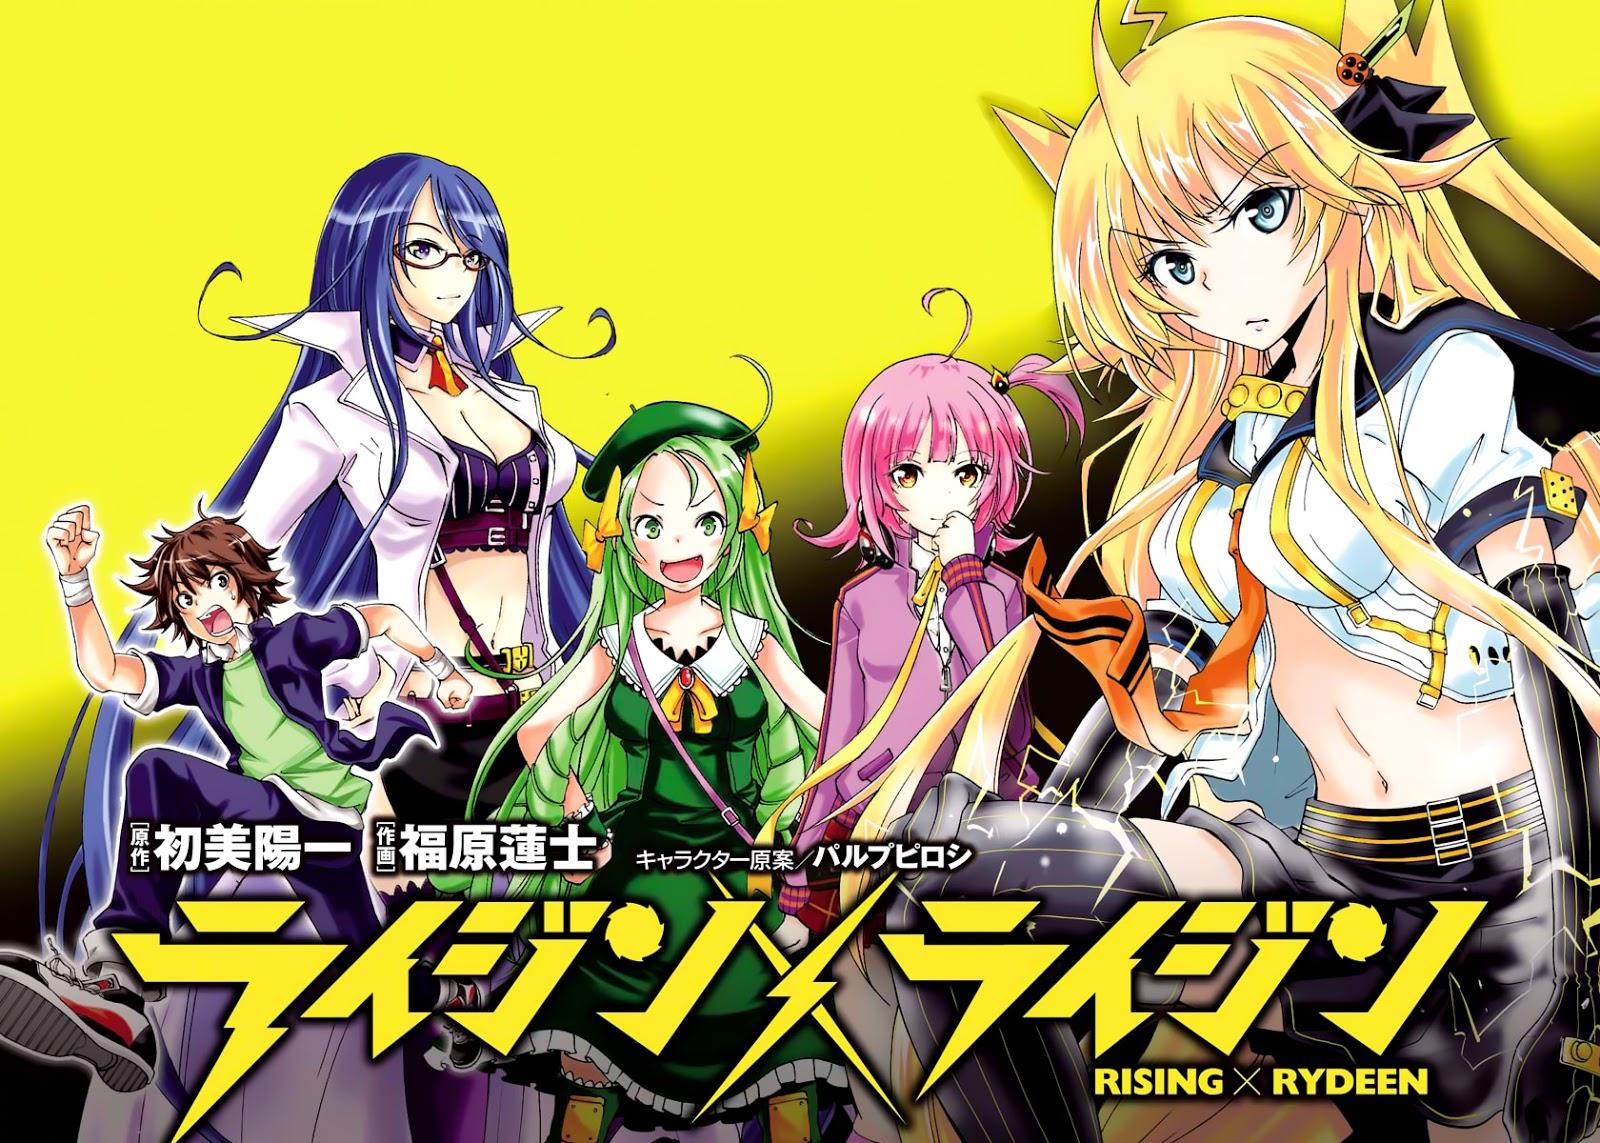 Genres Action Comedy Ecchi Romance School Sci Fi Harem Supernatural Authors Fukuhara Renji Art Hatsumi Youichi Story